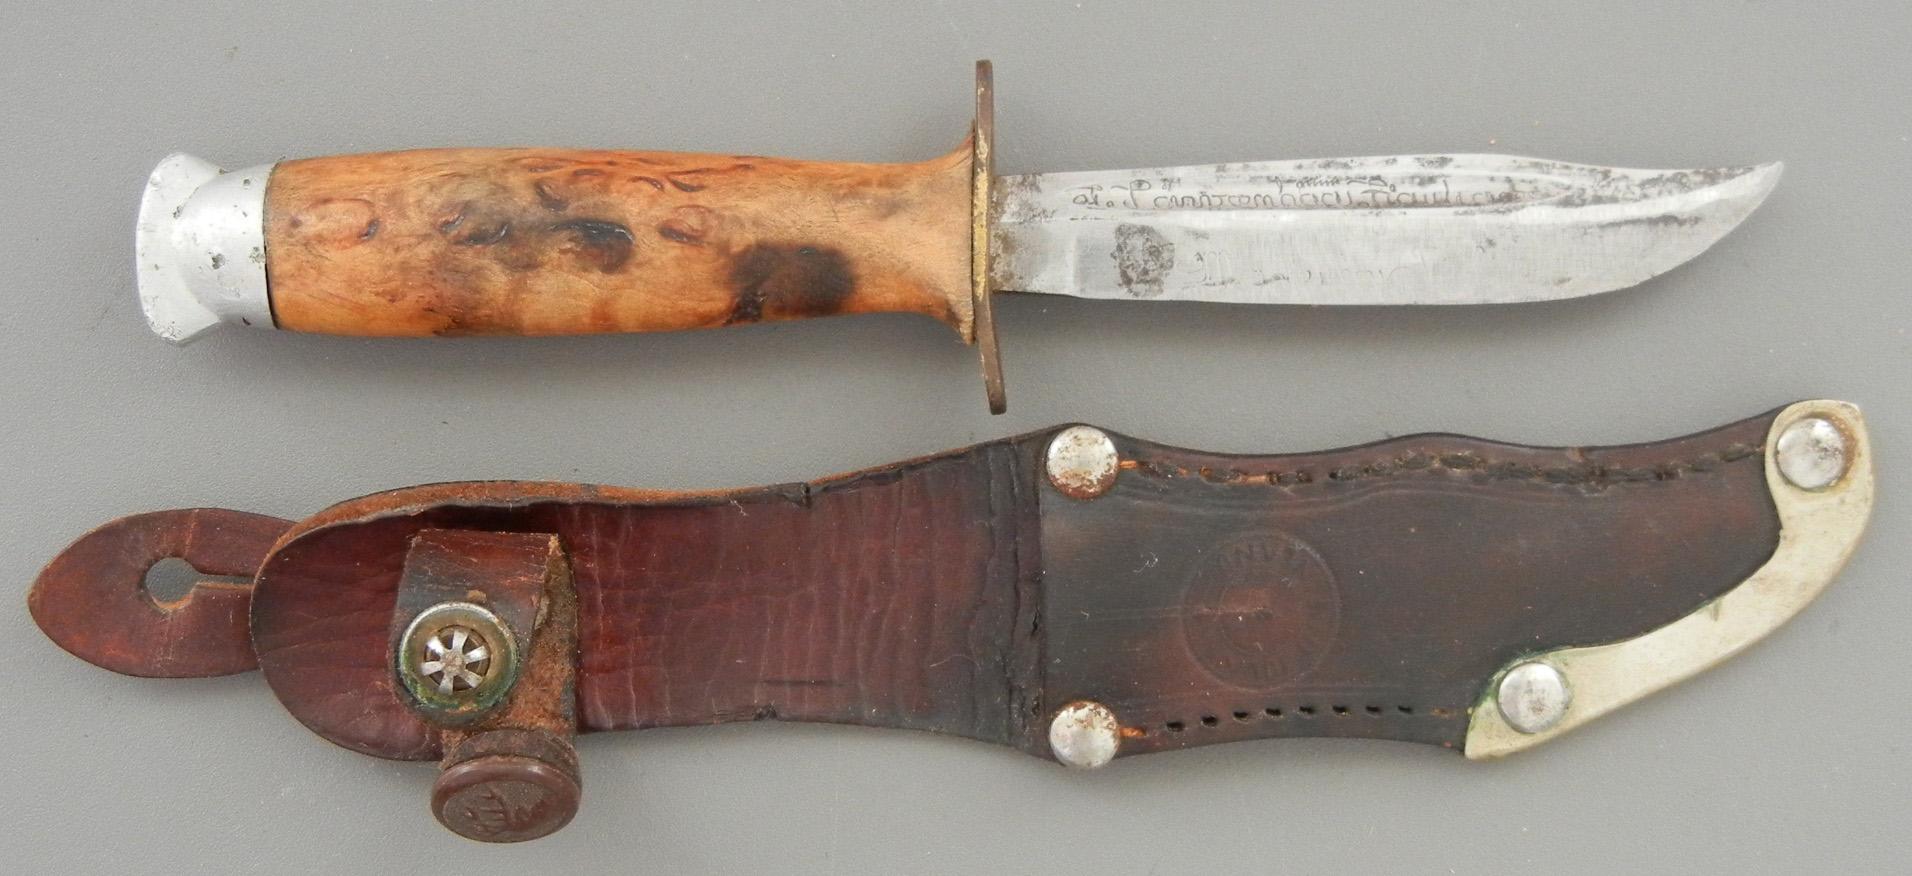 New Products : Kellam Knives Worldwide, Inc  - Finnish Puukko Knives